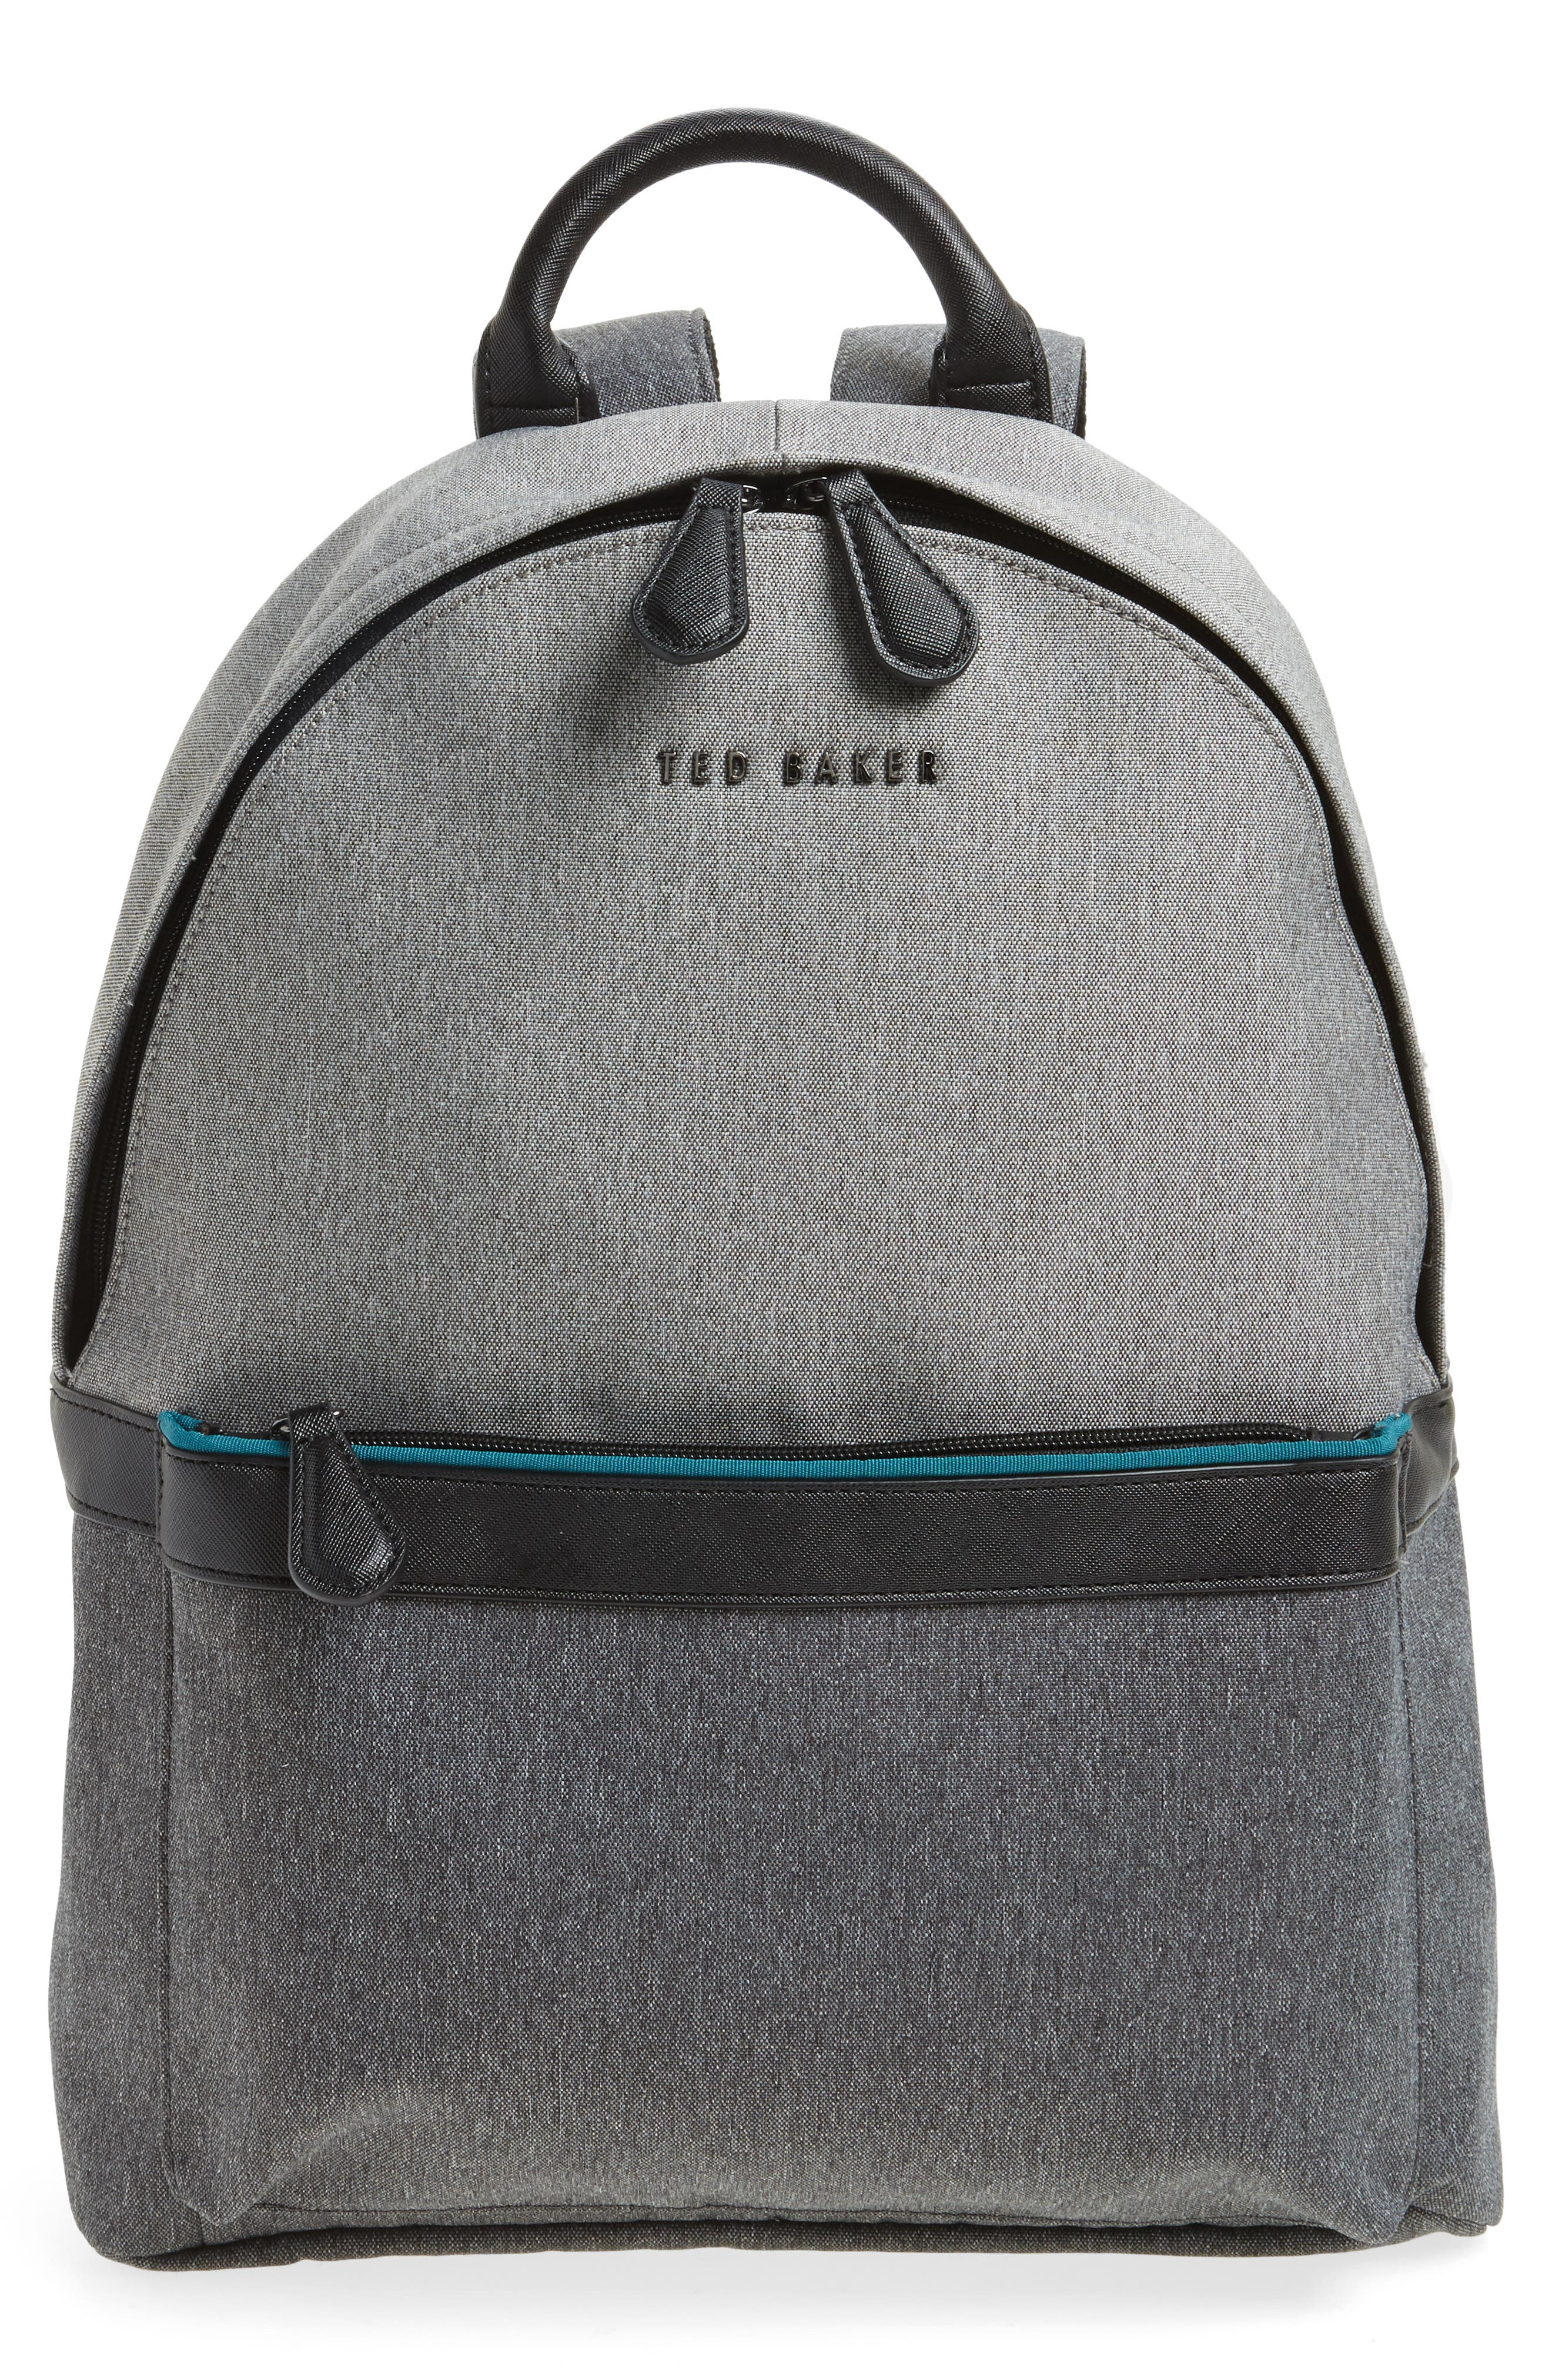 Zirabi Backpack,                         Main,                         color, 030